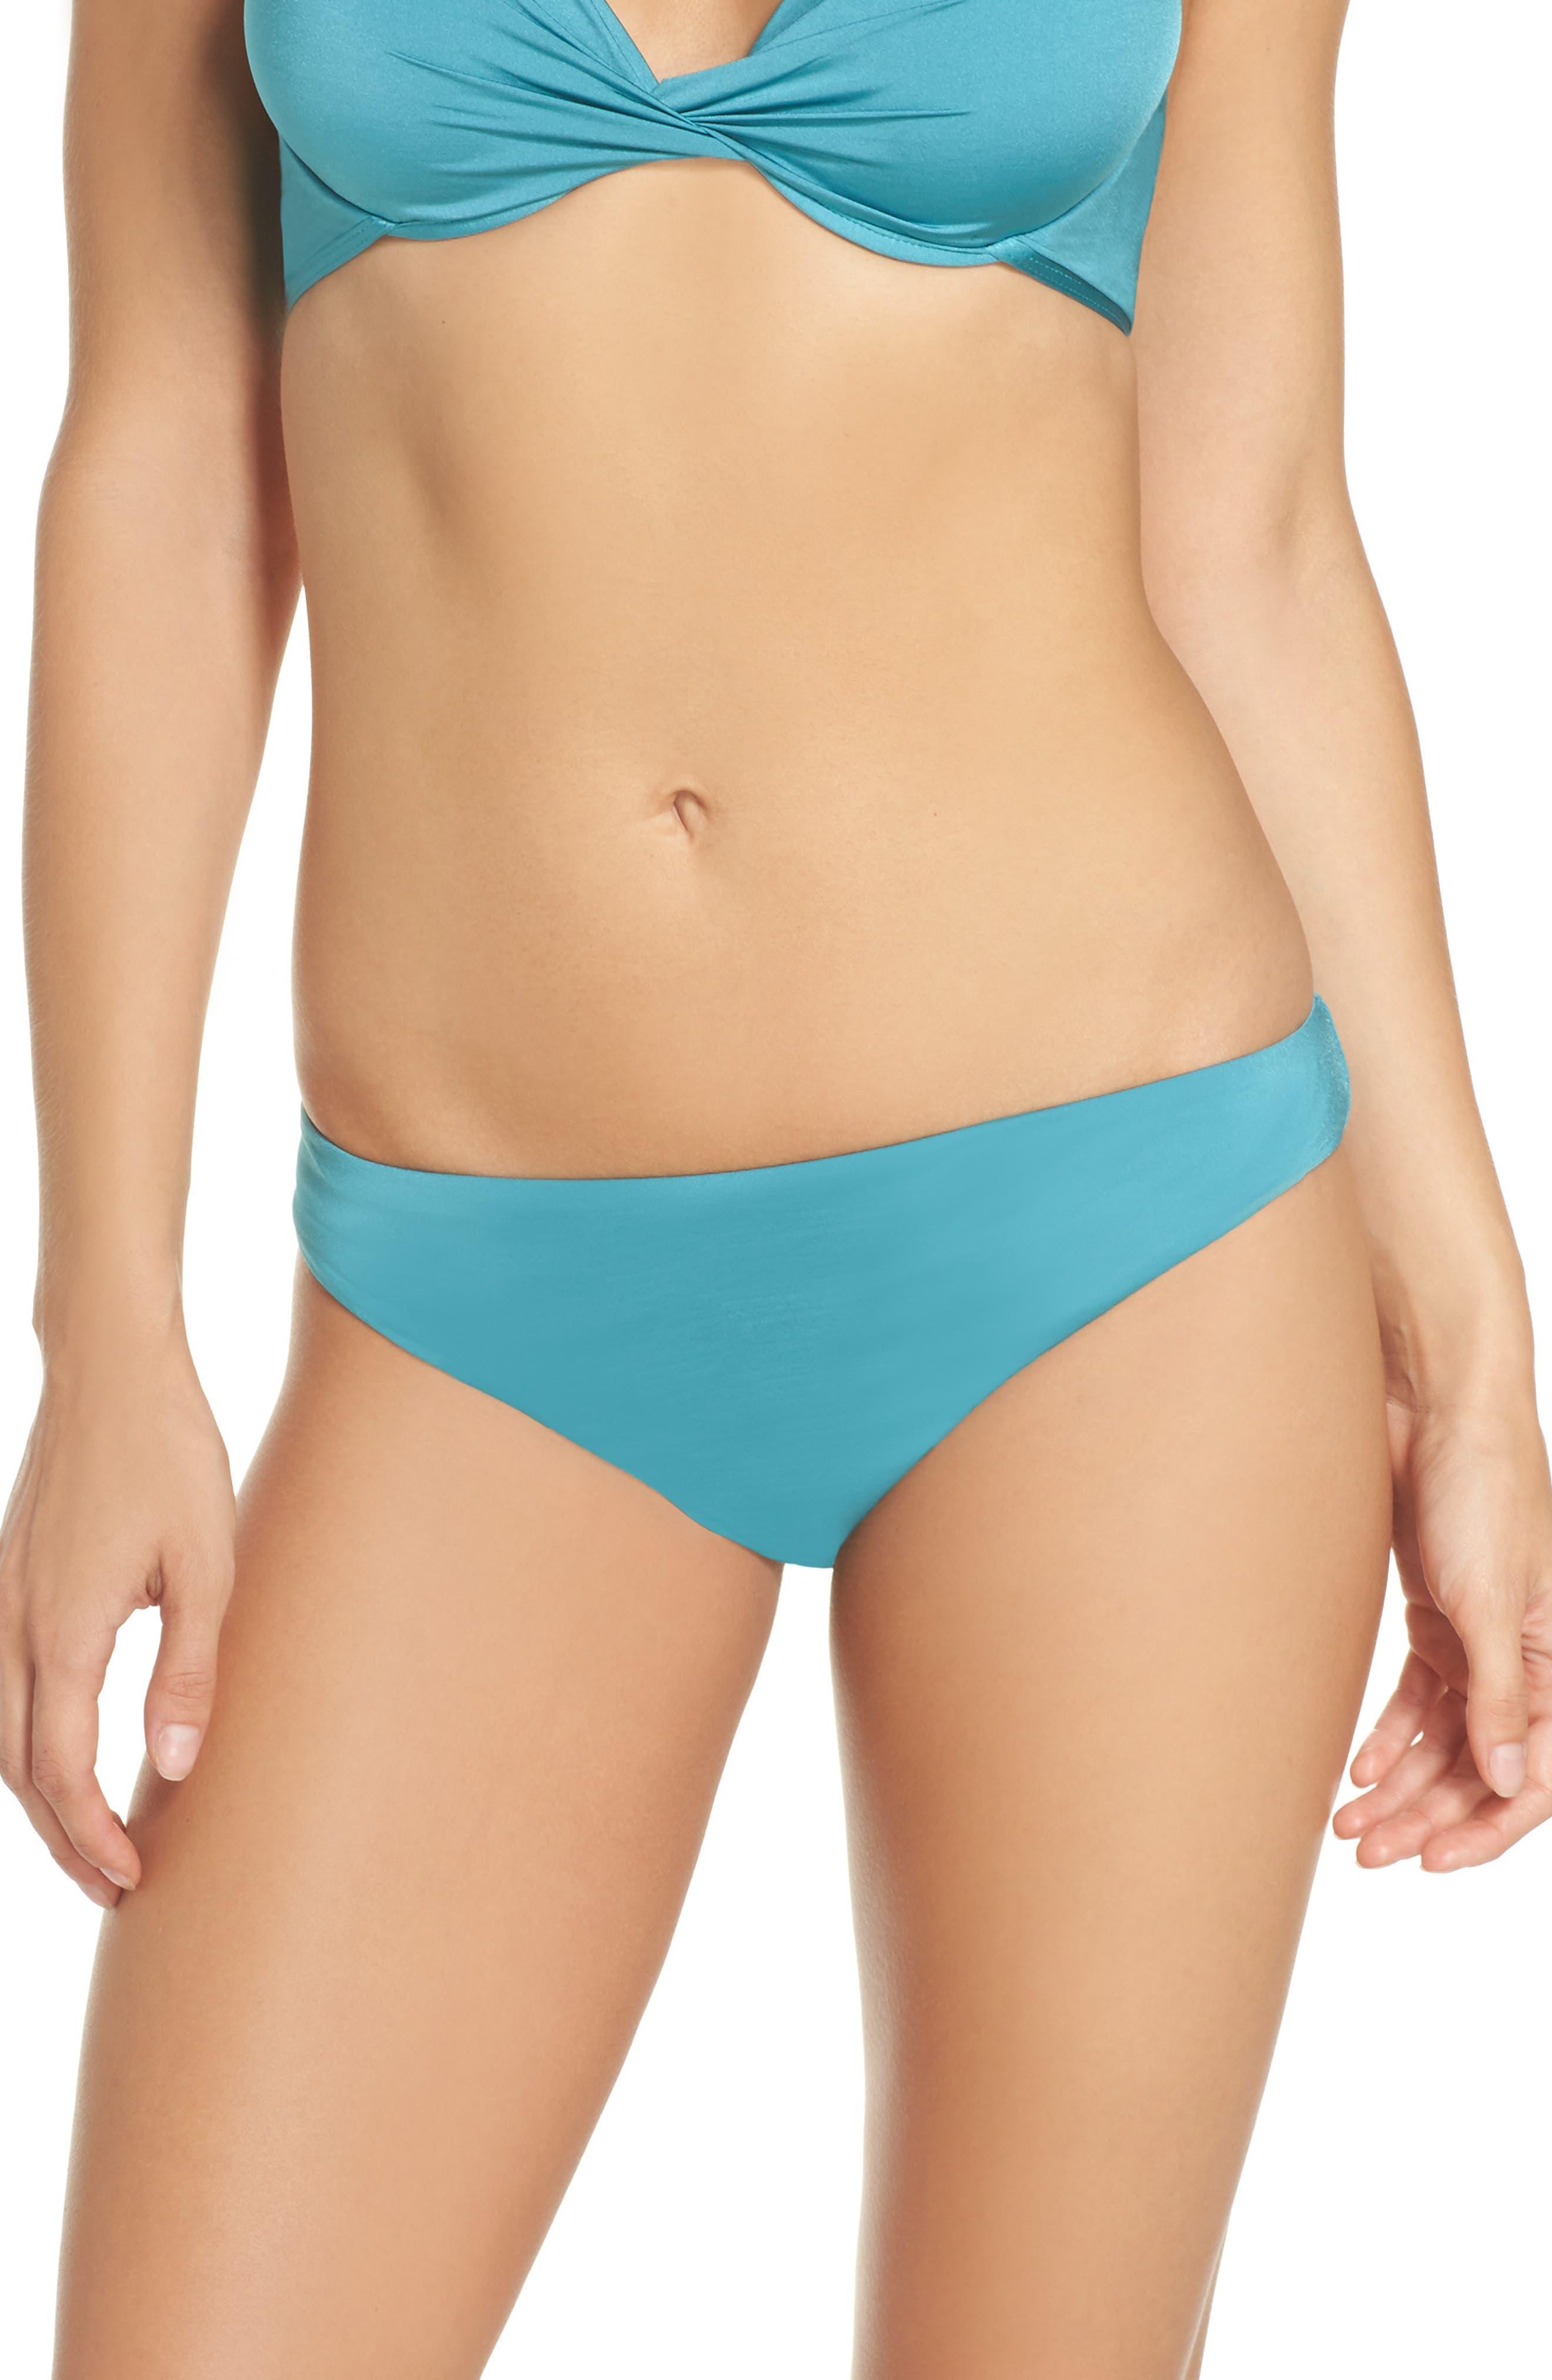 Hipster Bikini Bottoms,                             Main thumbnail 1, color,                             Aqua